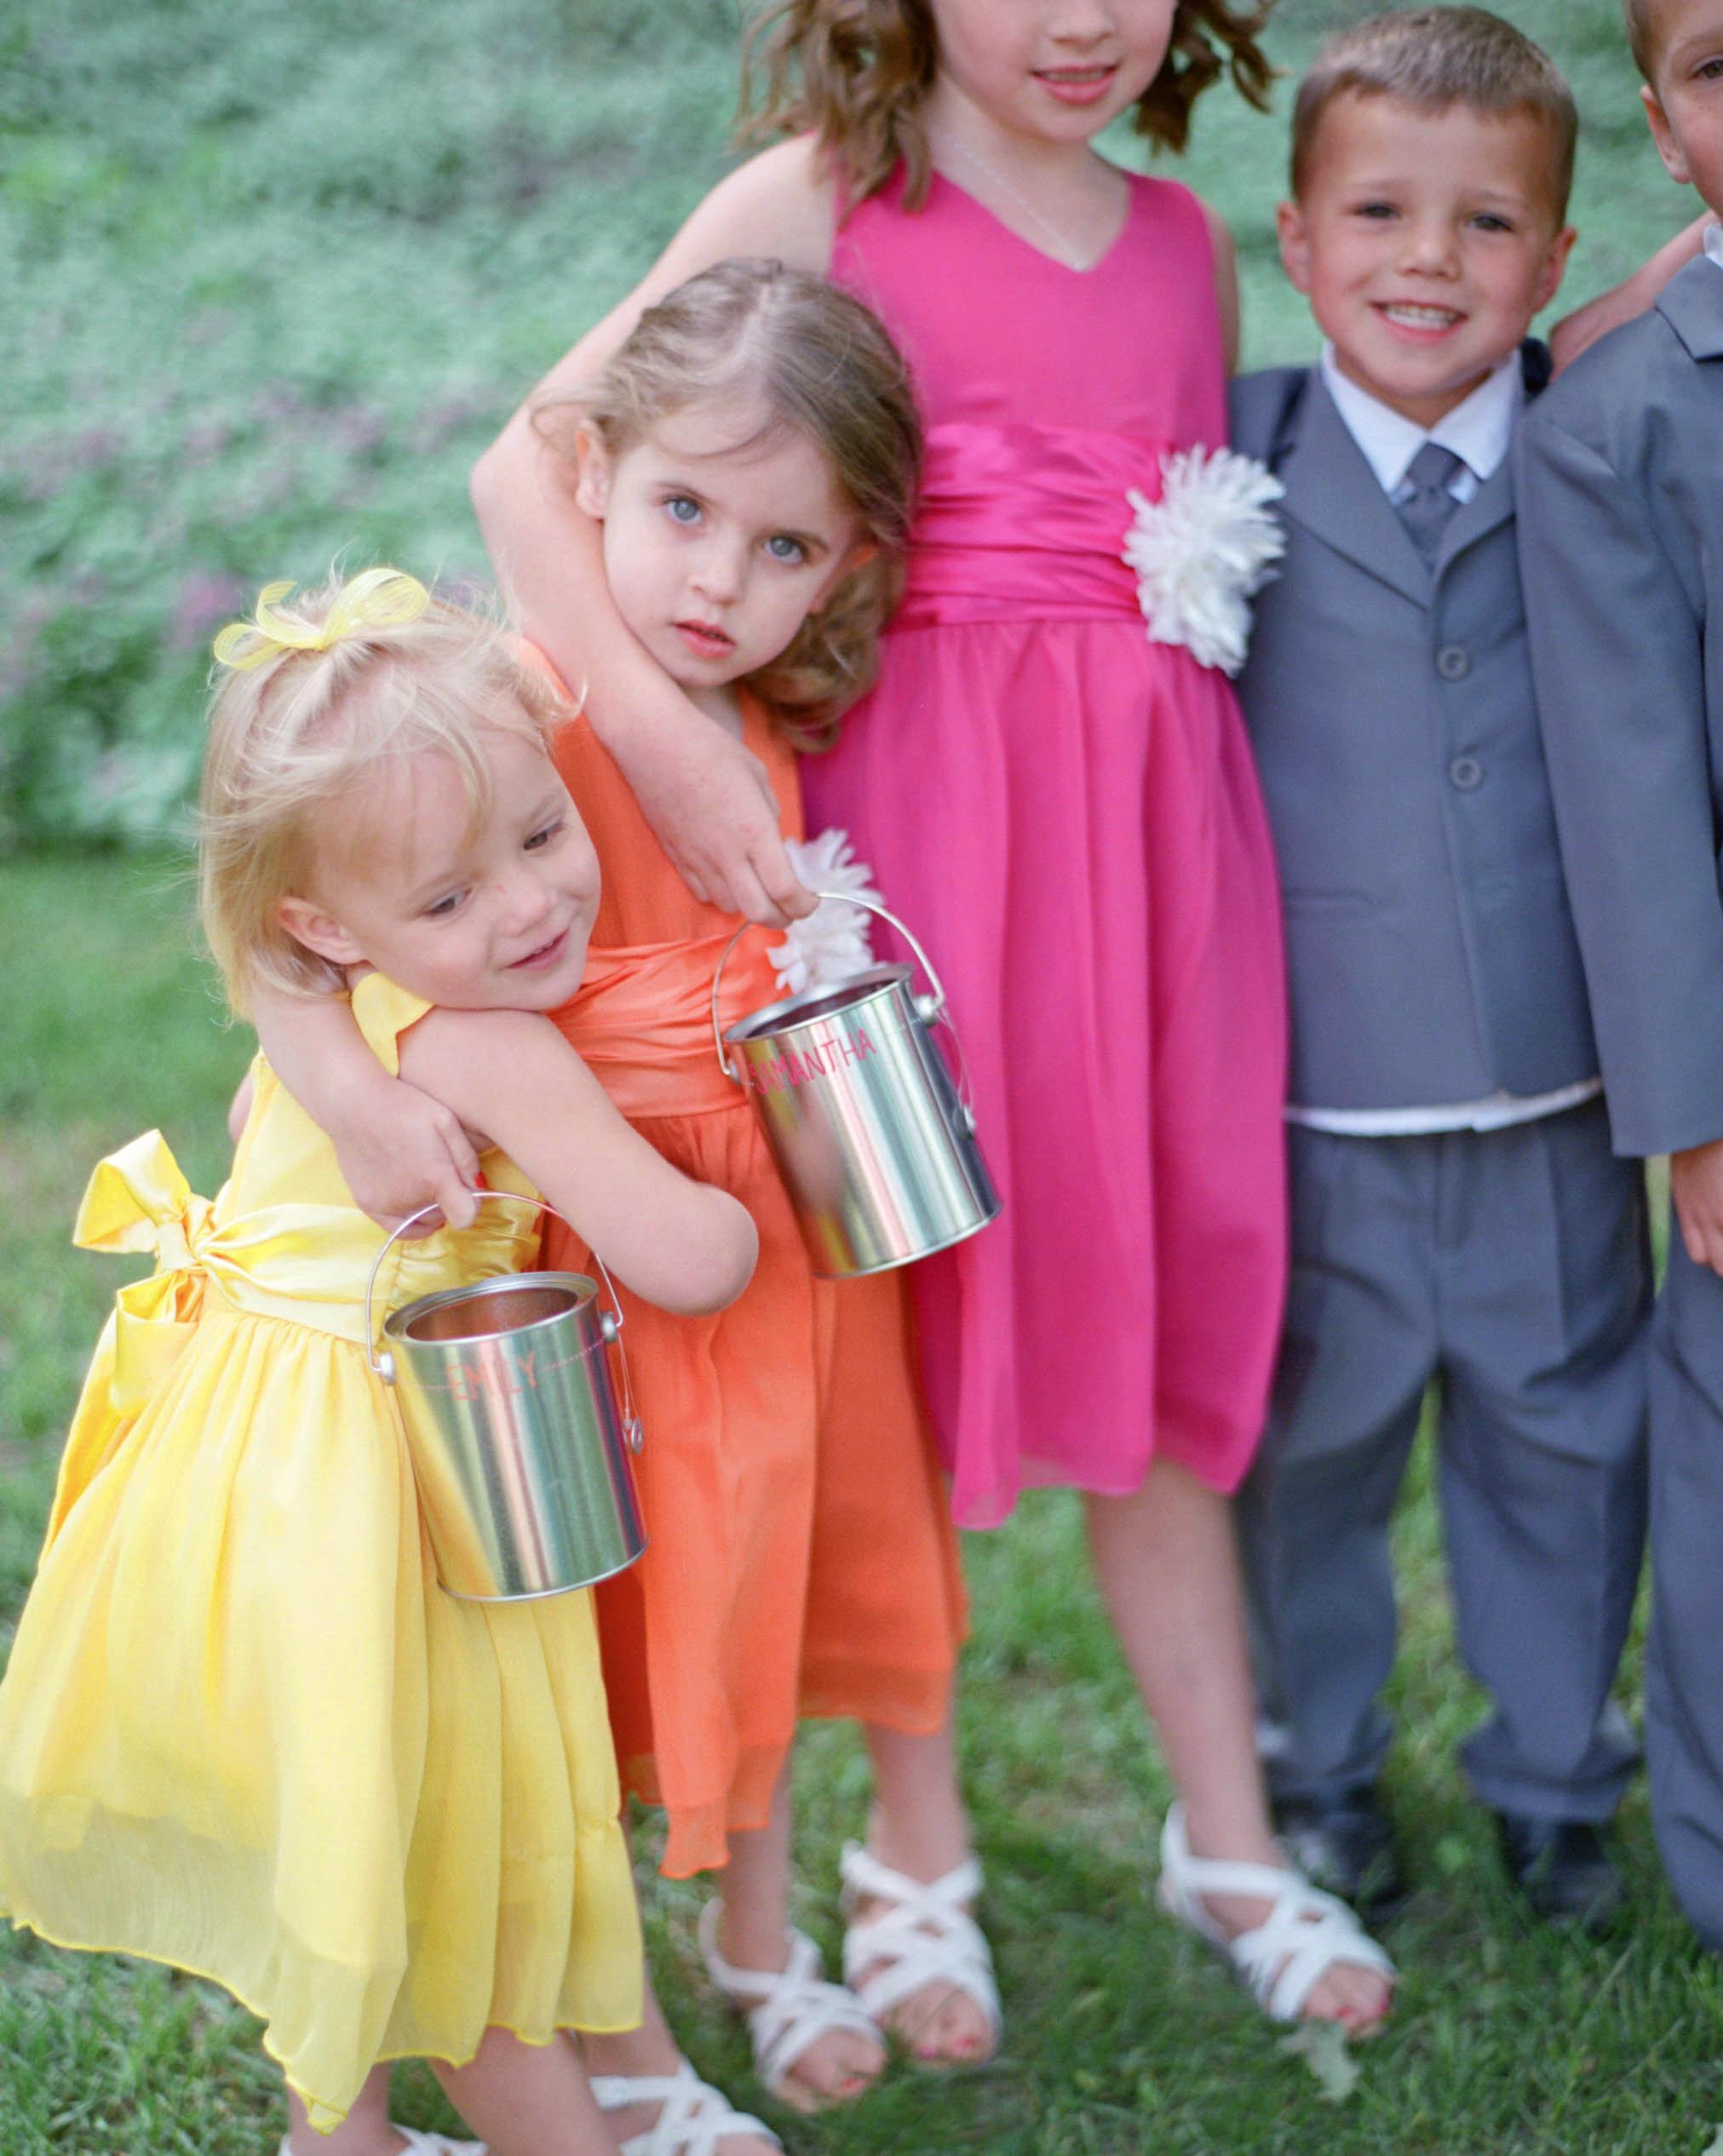 liz-jeff-wedding-kids-130-s112303-1115.jpg